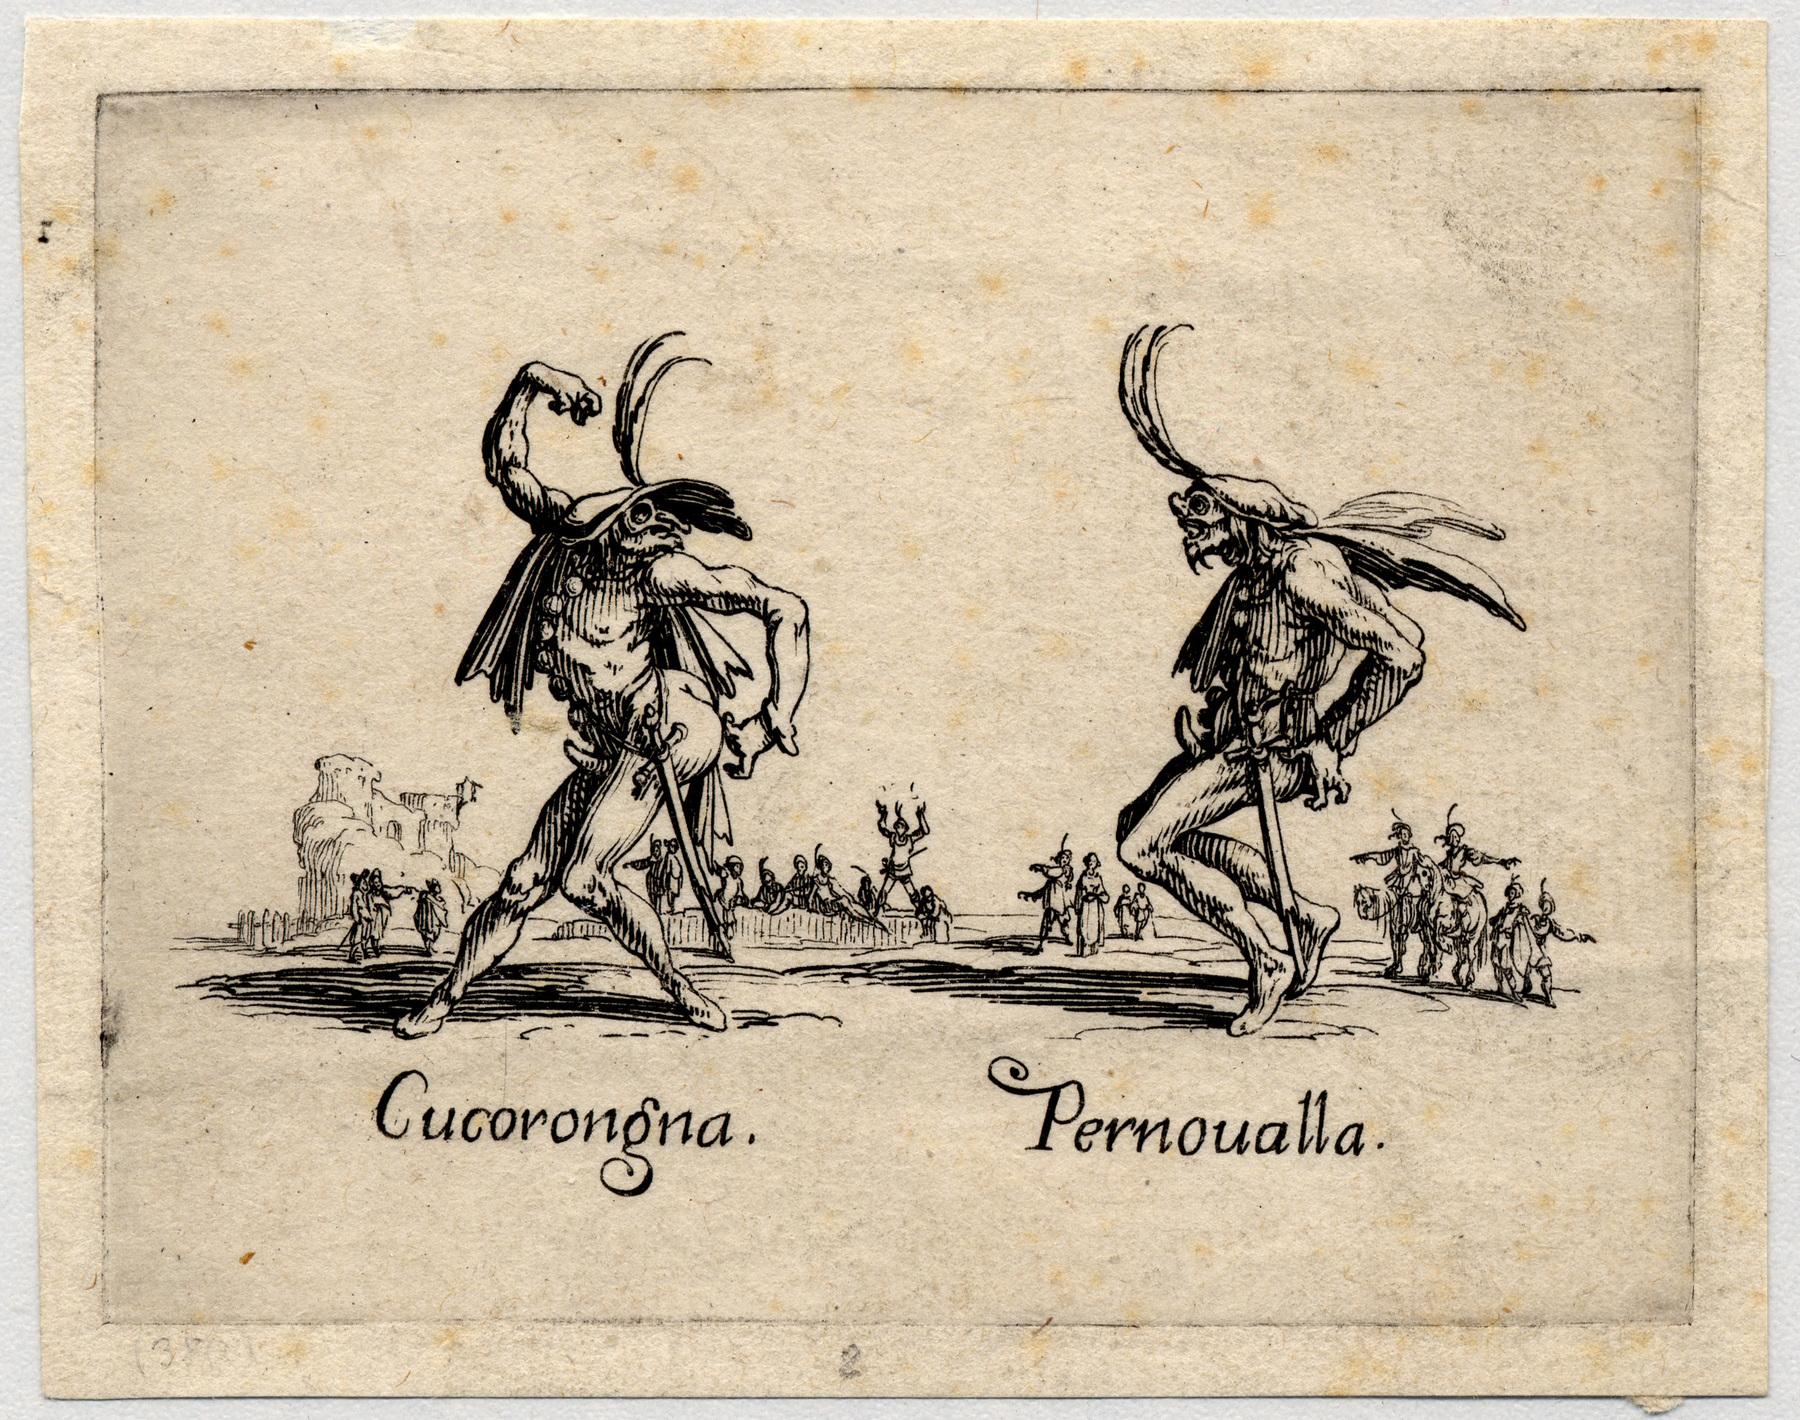 Contenu du Balli di Sfessania: Cucorongna, Pernoualla